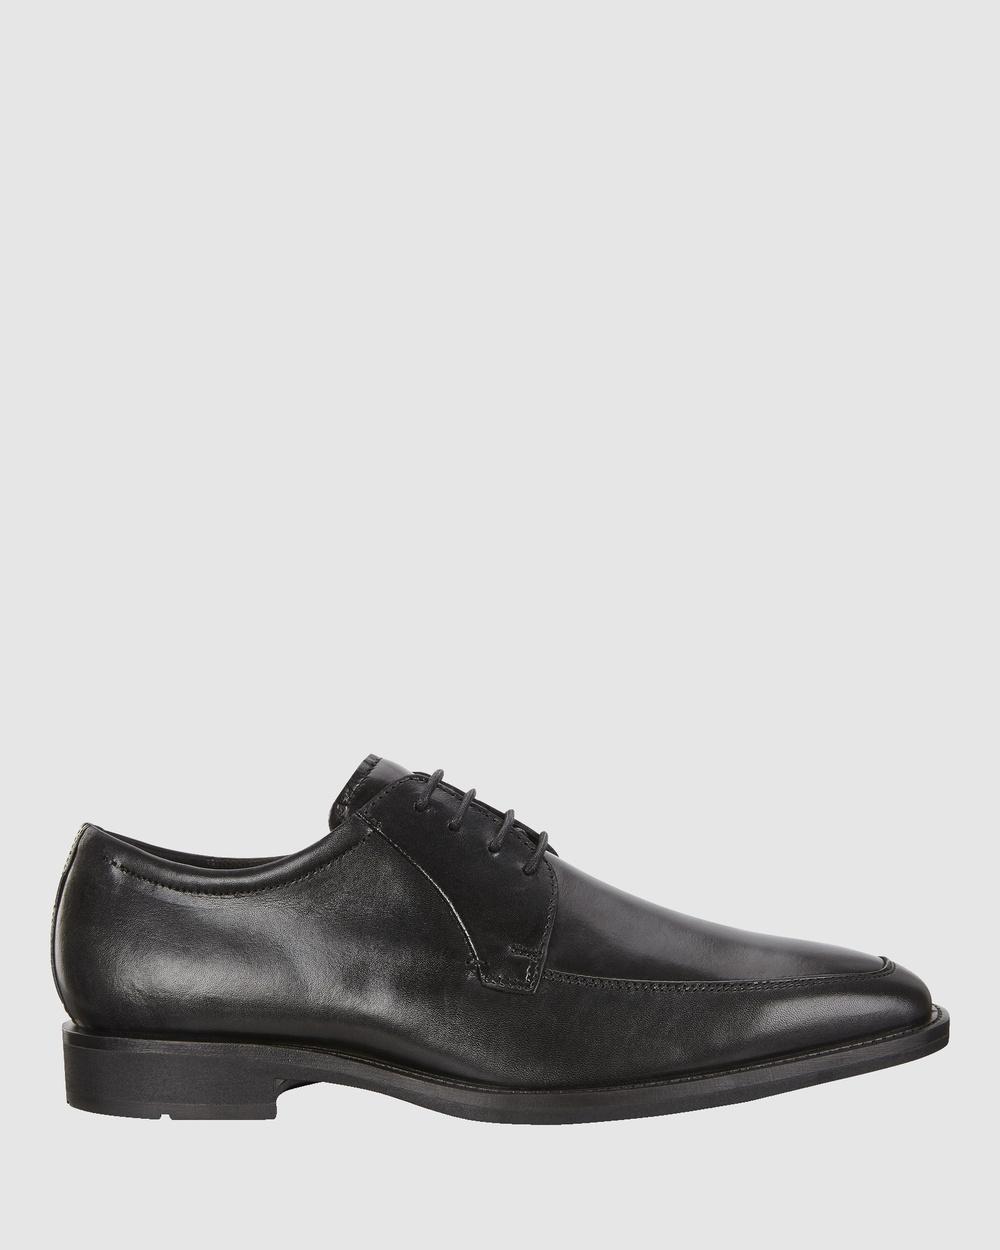 ECCO Calcan Derby Shoes Dress Black